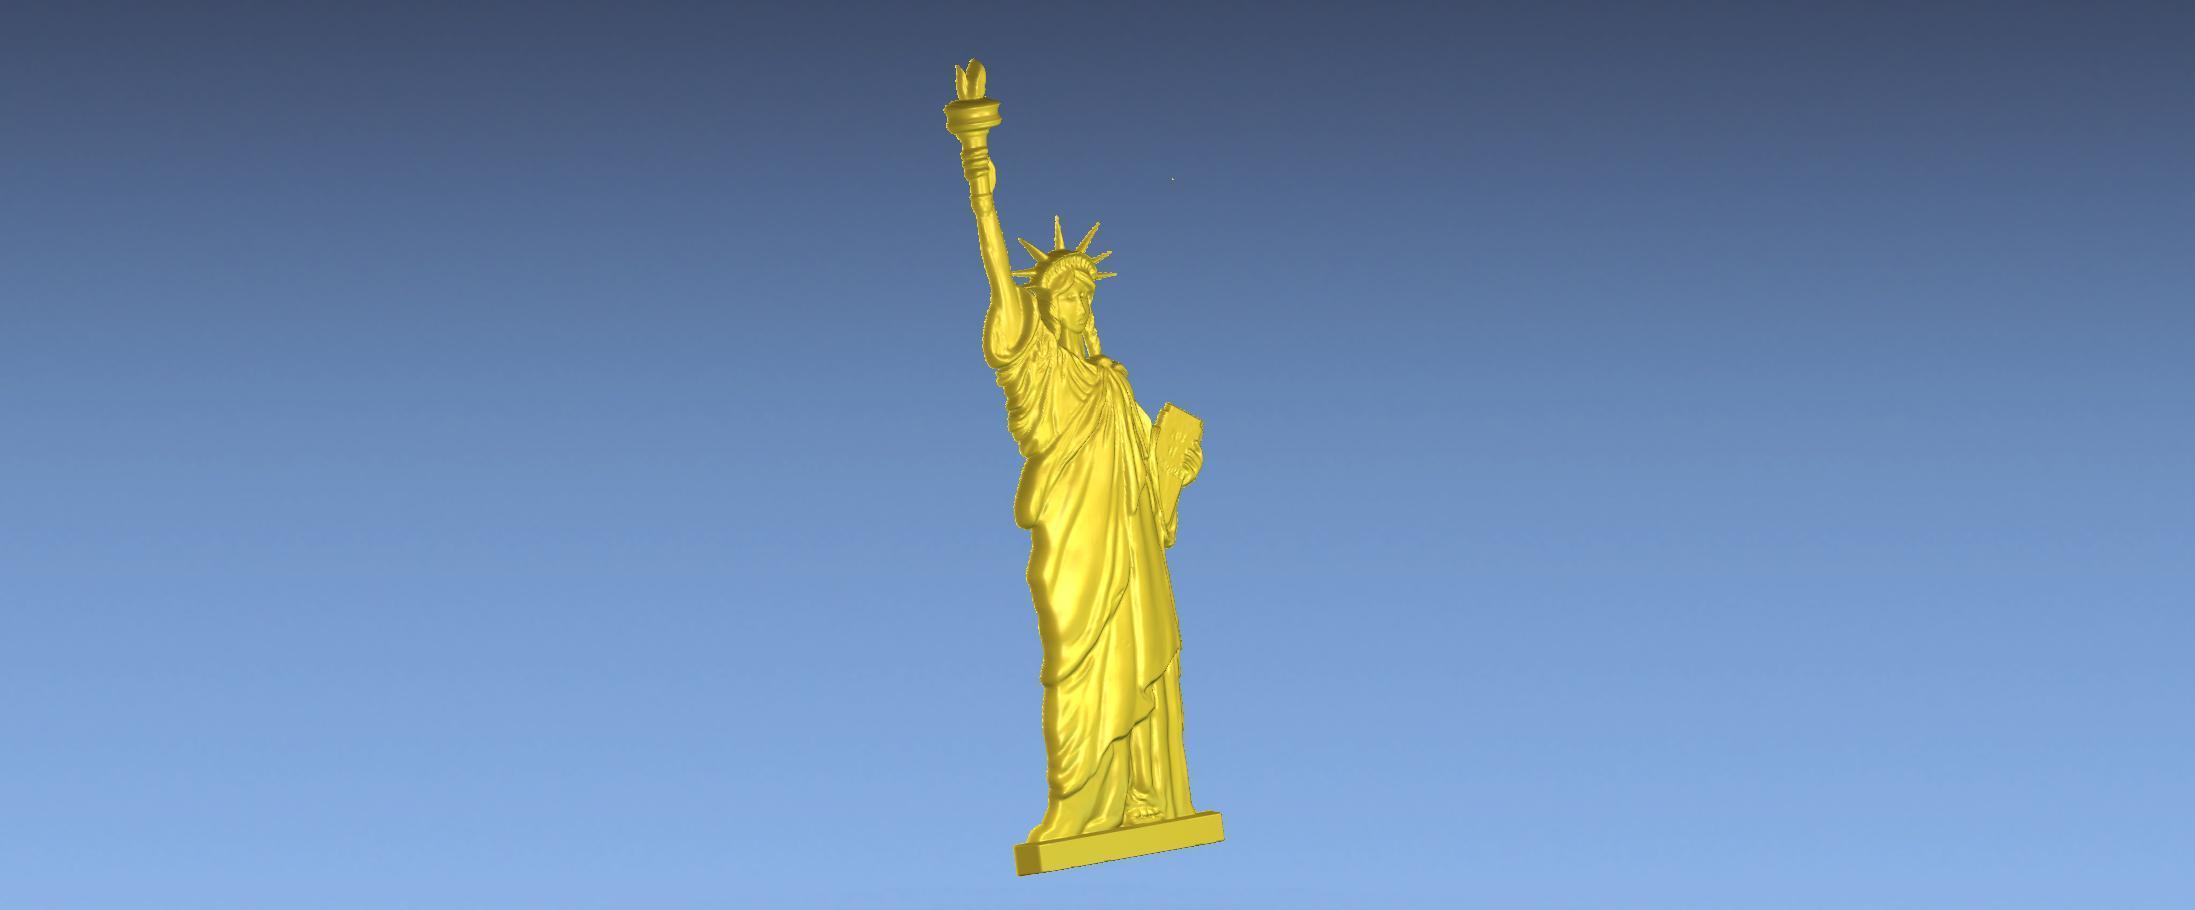 2.jpg Download free STL file LIBRETY STATUE 3D STL FILE • 3D printing design, ALPHA_MENA